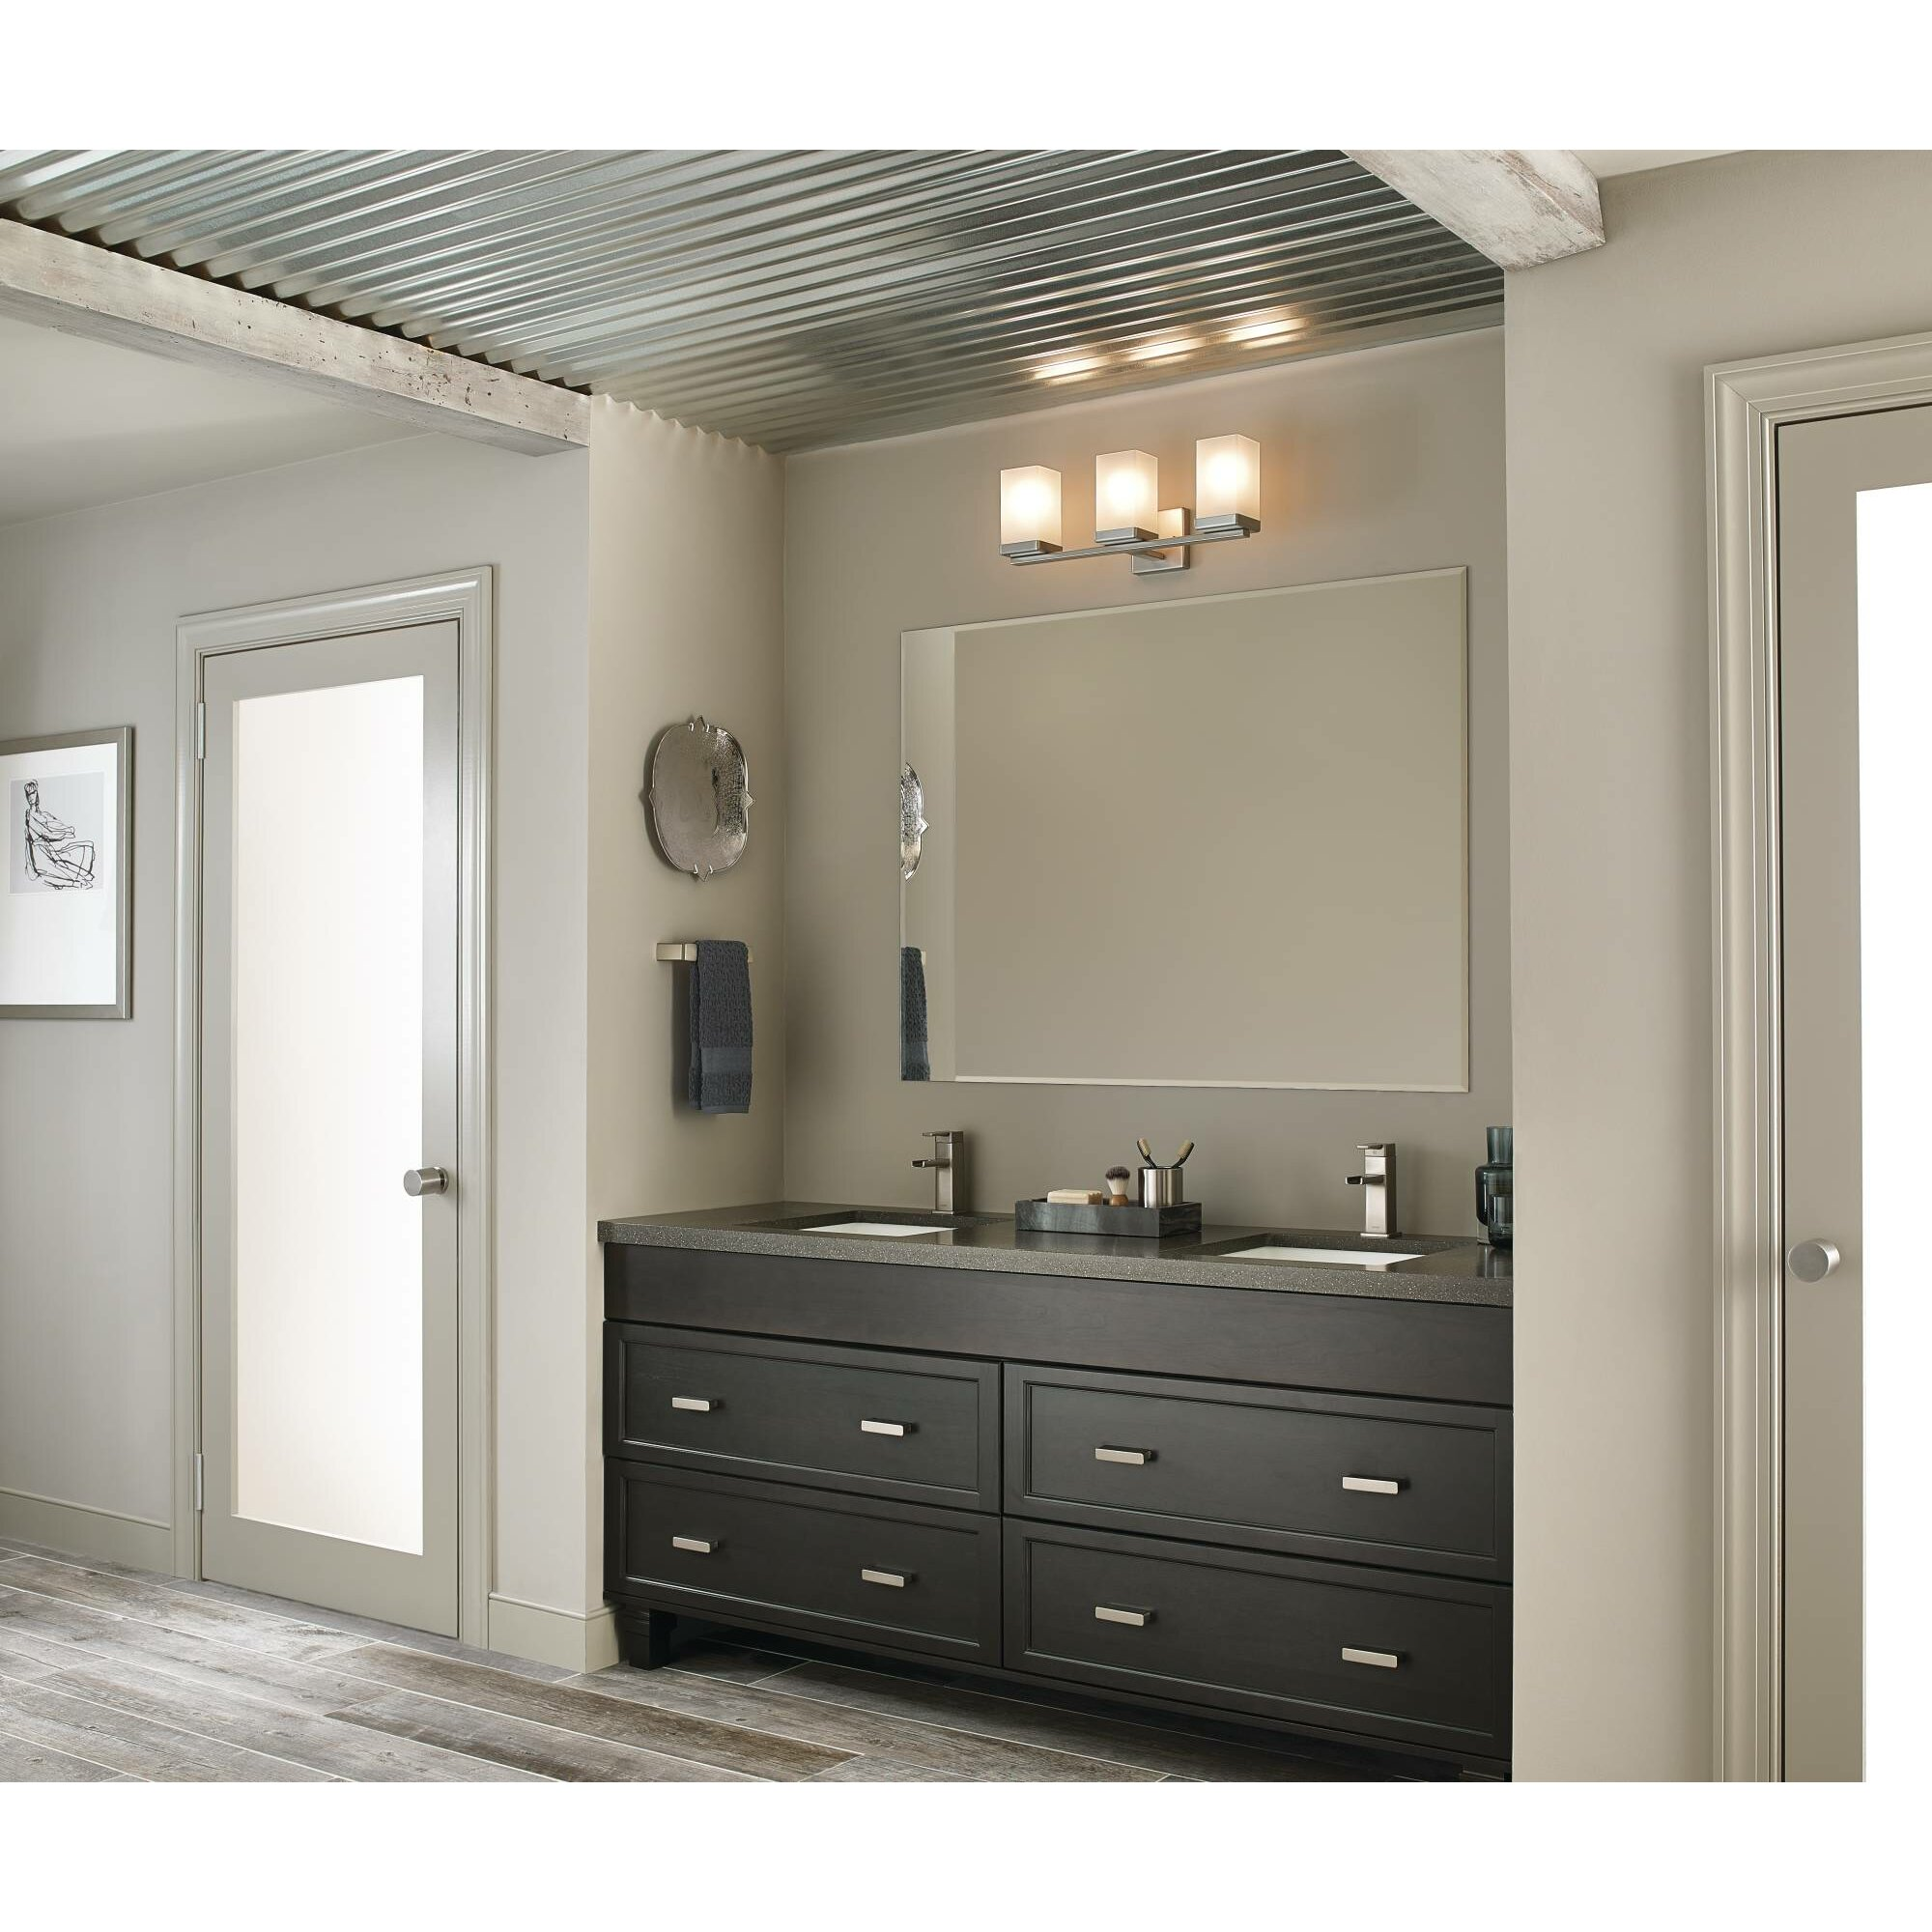 Moen Yb8863ch 90 Degree Chrome Vanity Light Bathroom Lighting: Moen 90 Degree 3 Light Bath Vanity Light & Reviews